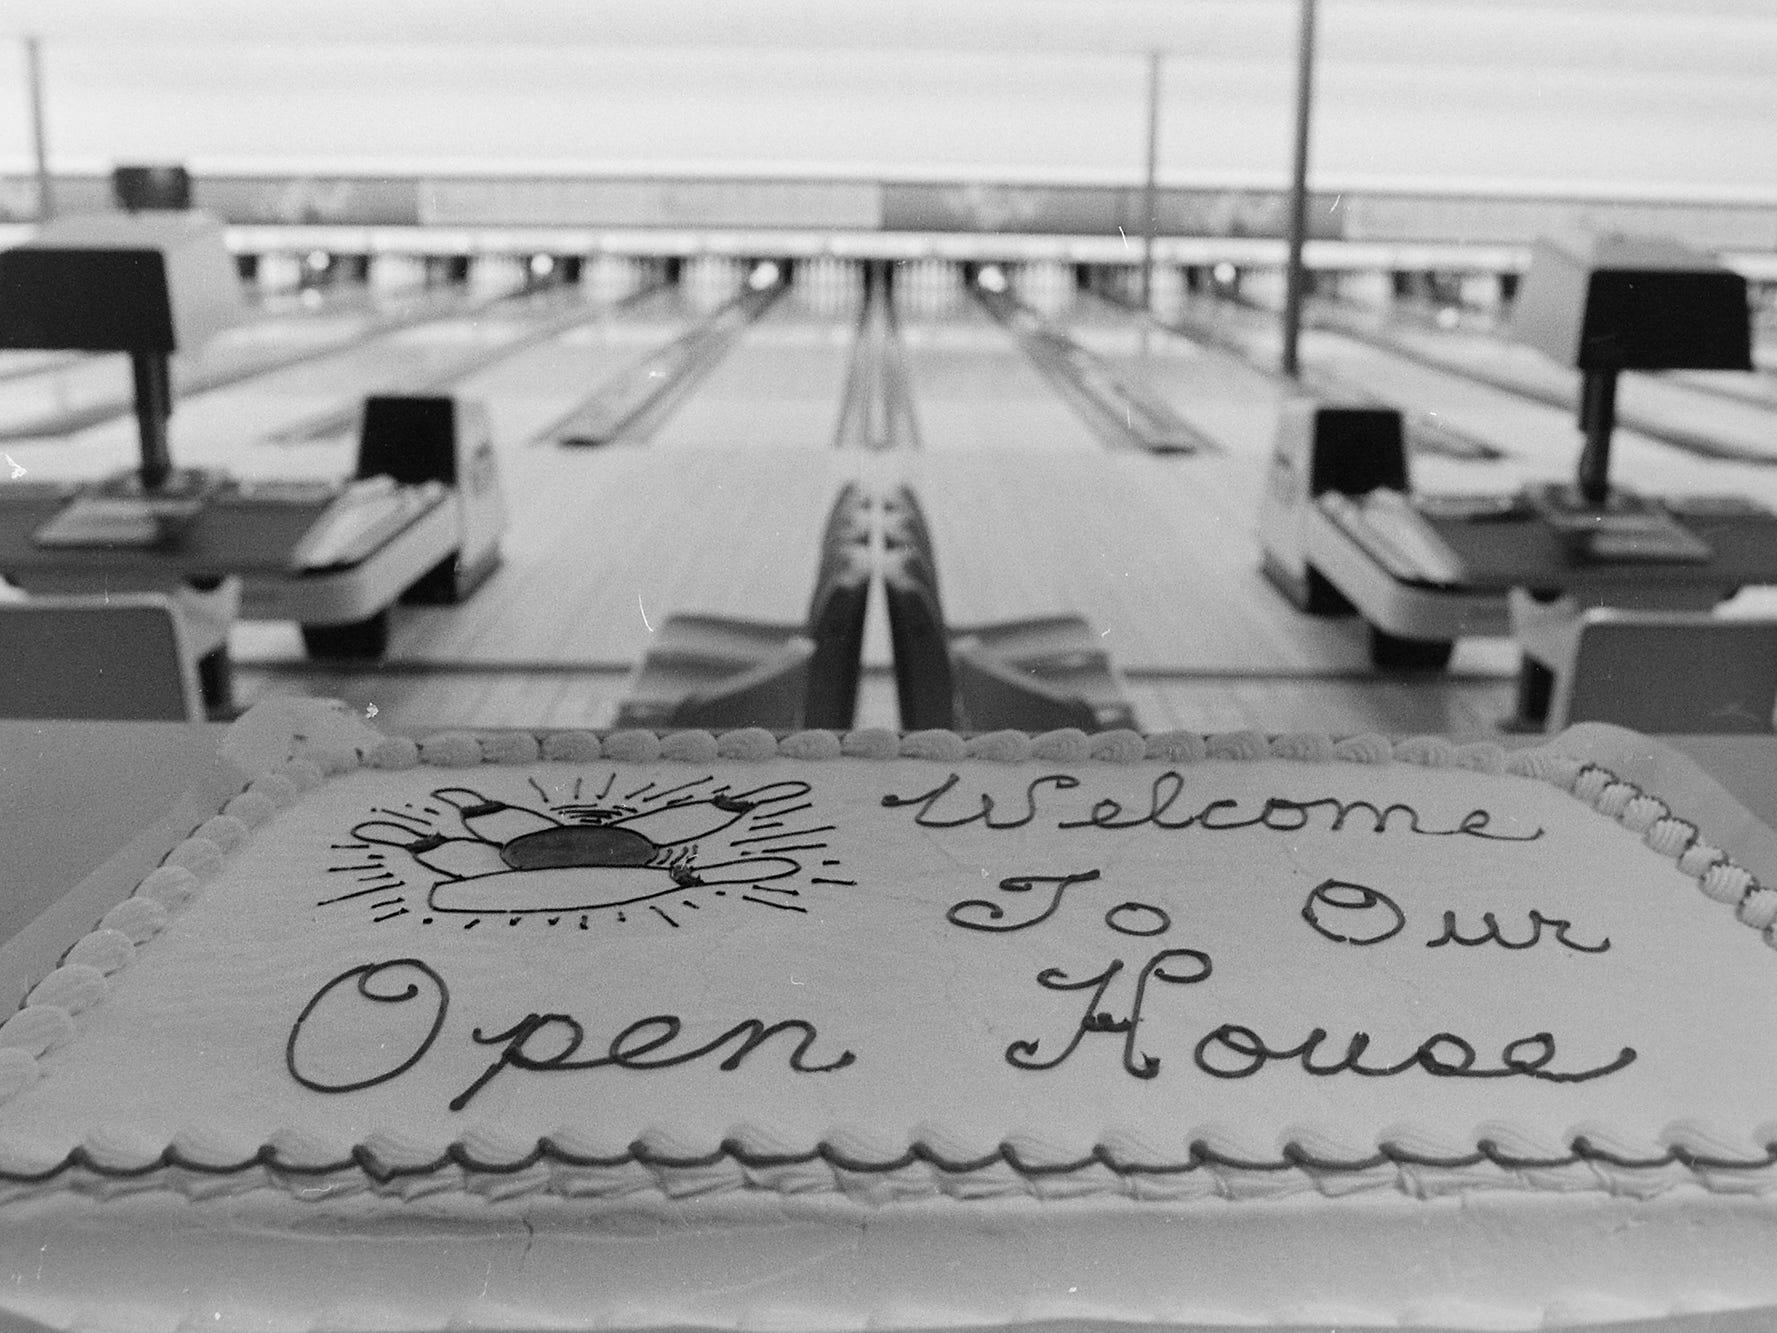 02/23/82Hi Joy Bowling Open House